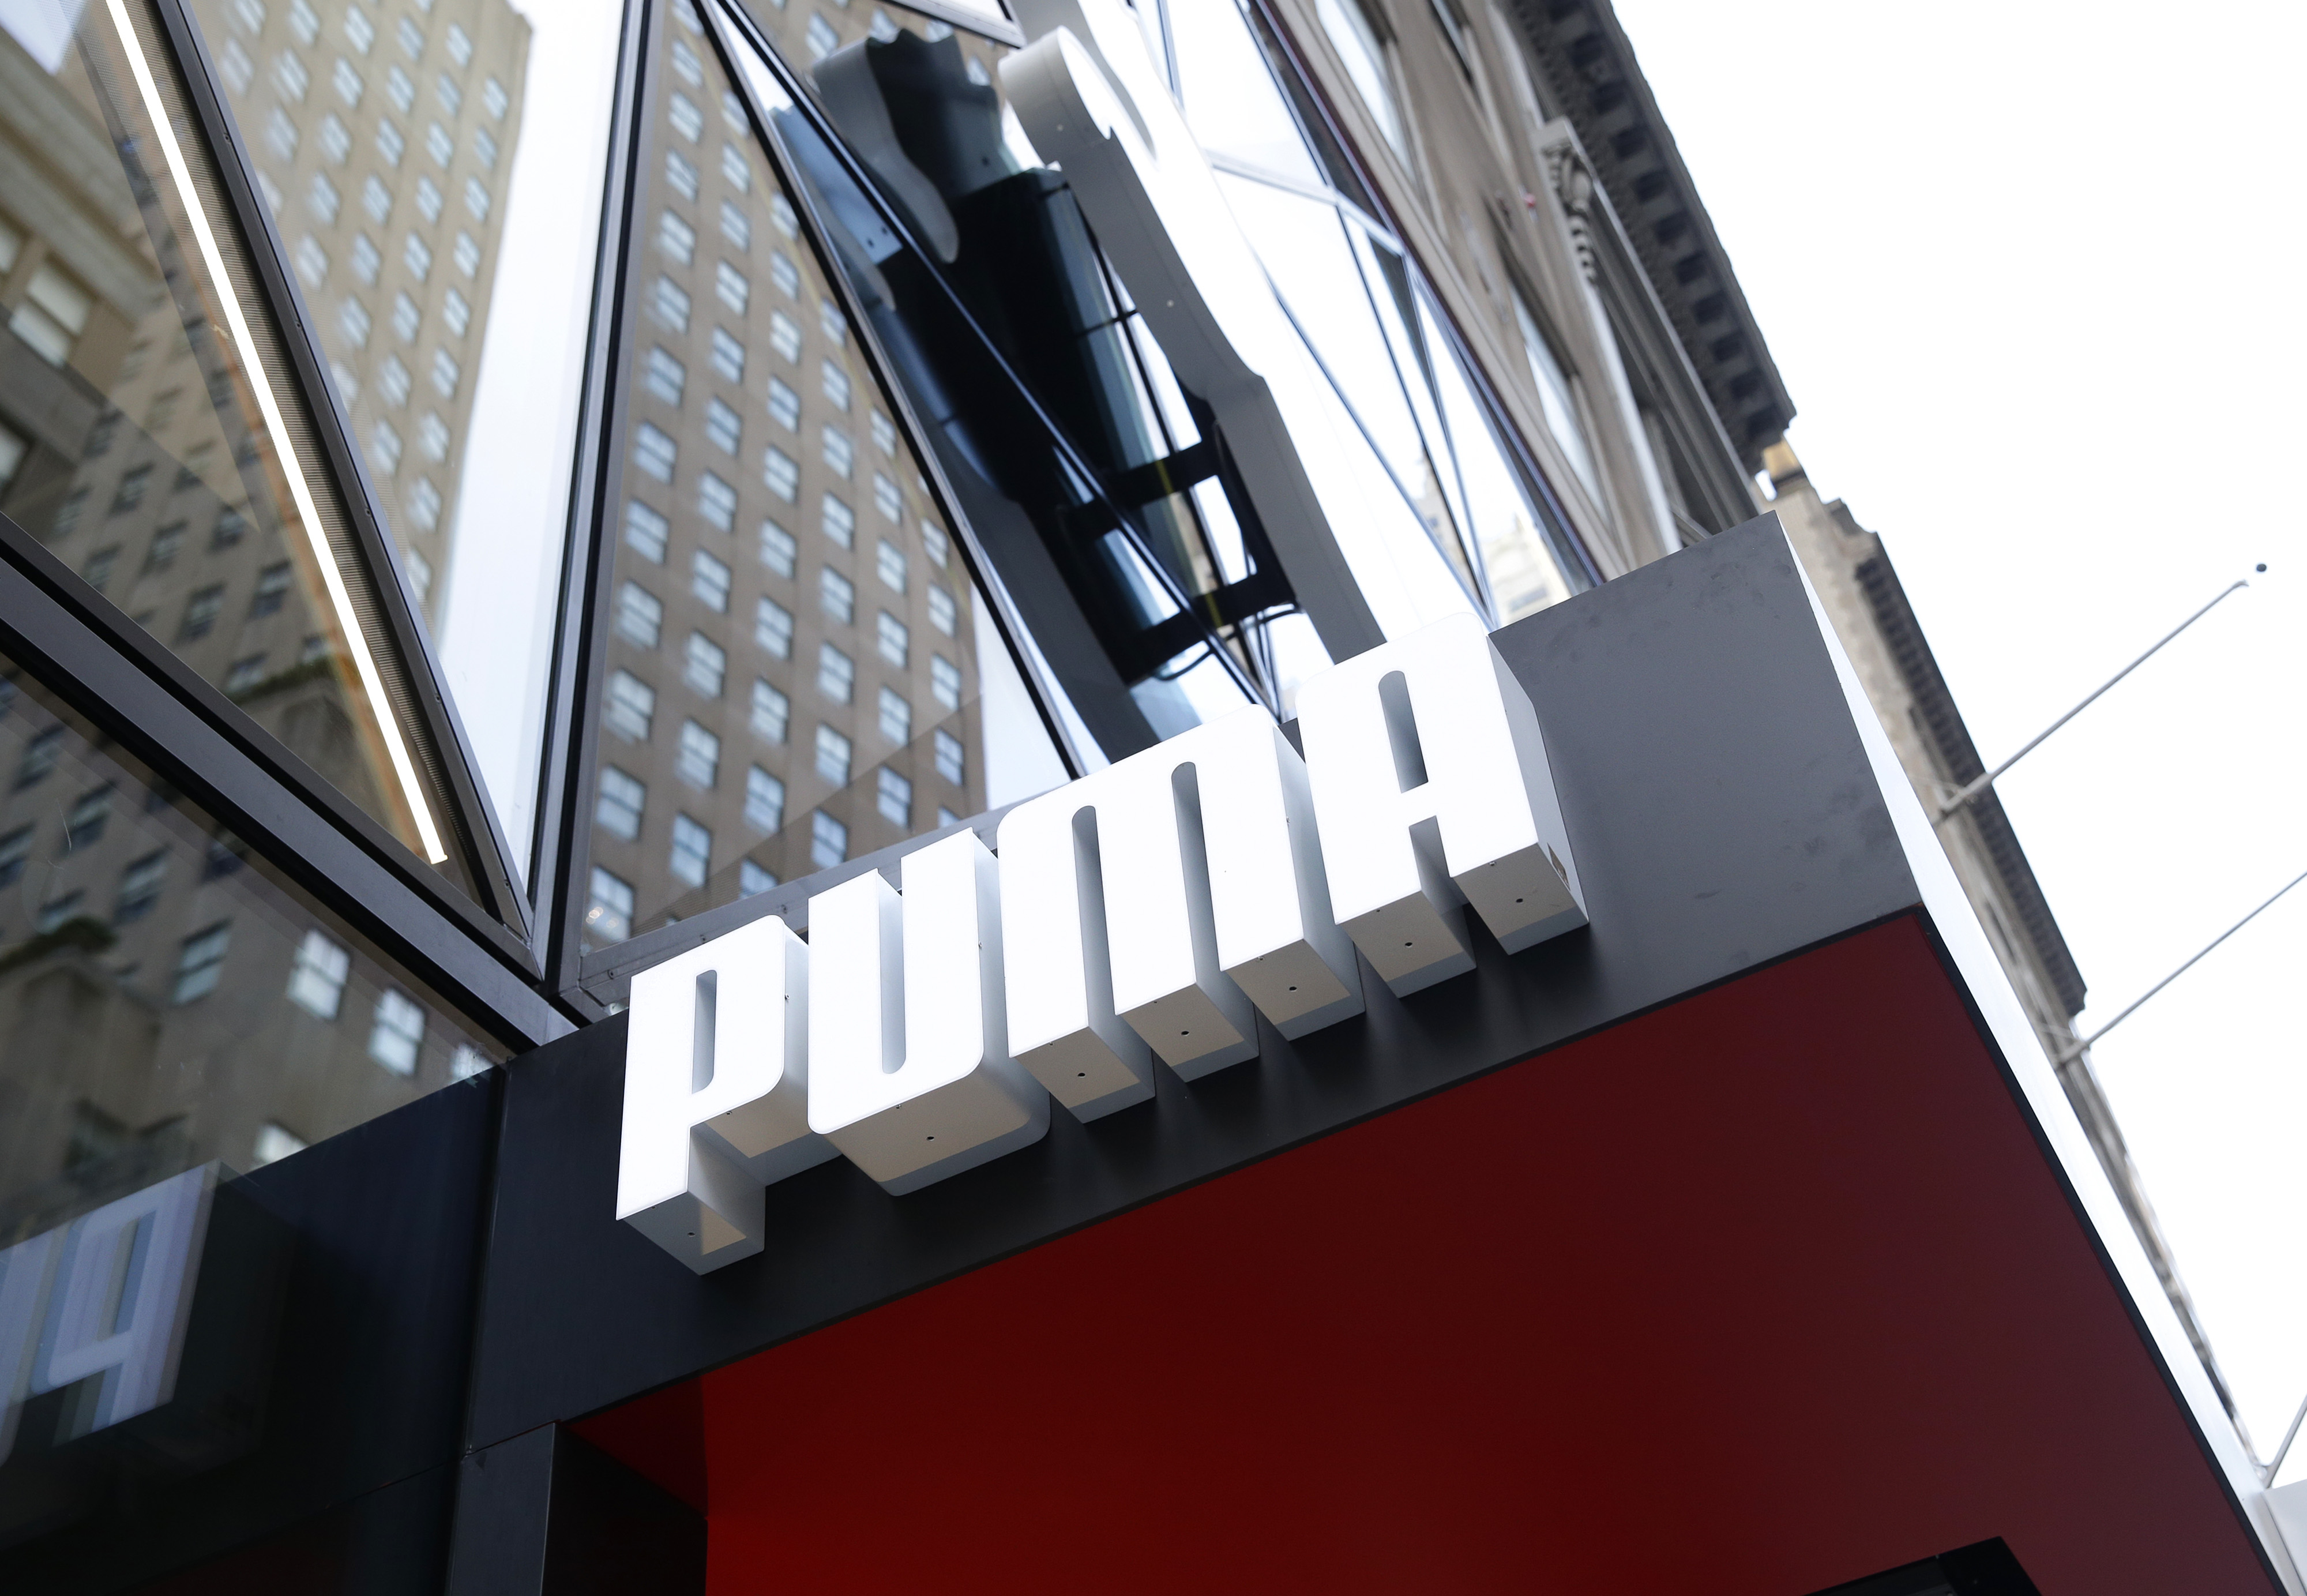 magasin puma new york